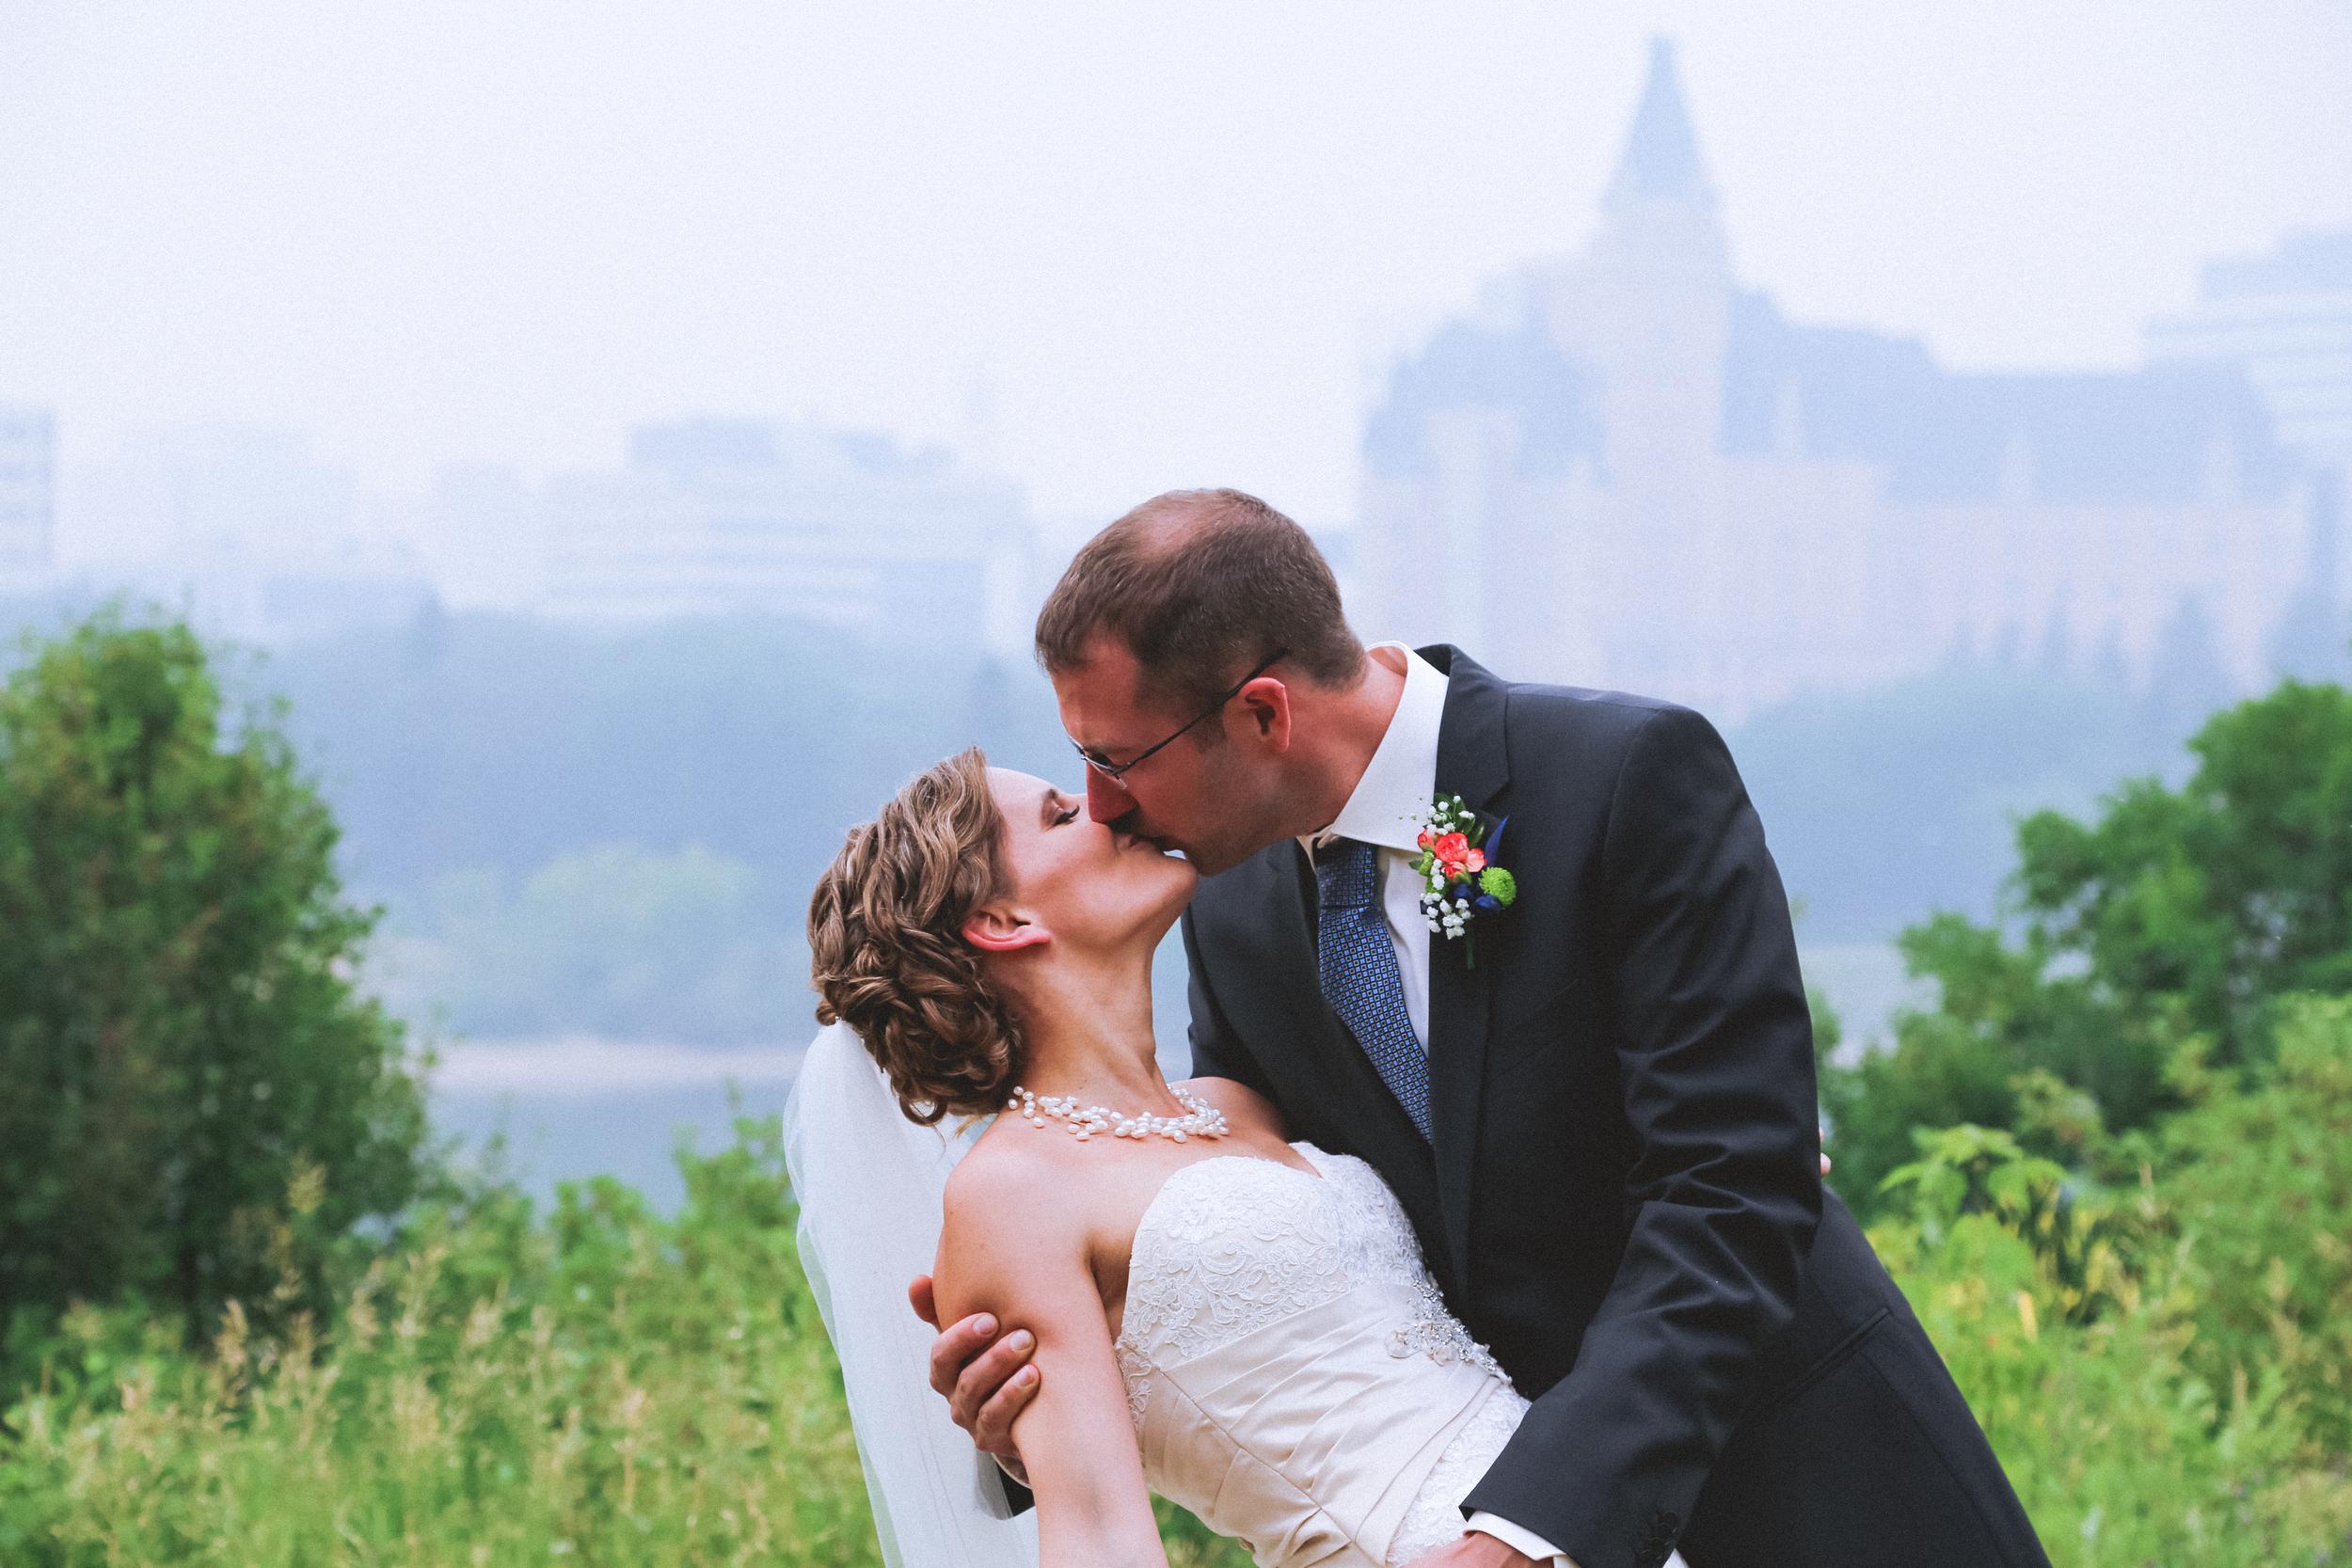 SharaiSiemens_Photography_Wedding_Three3.jpg